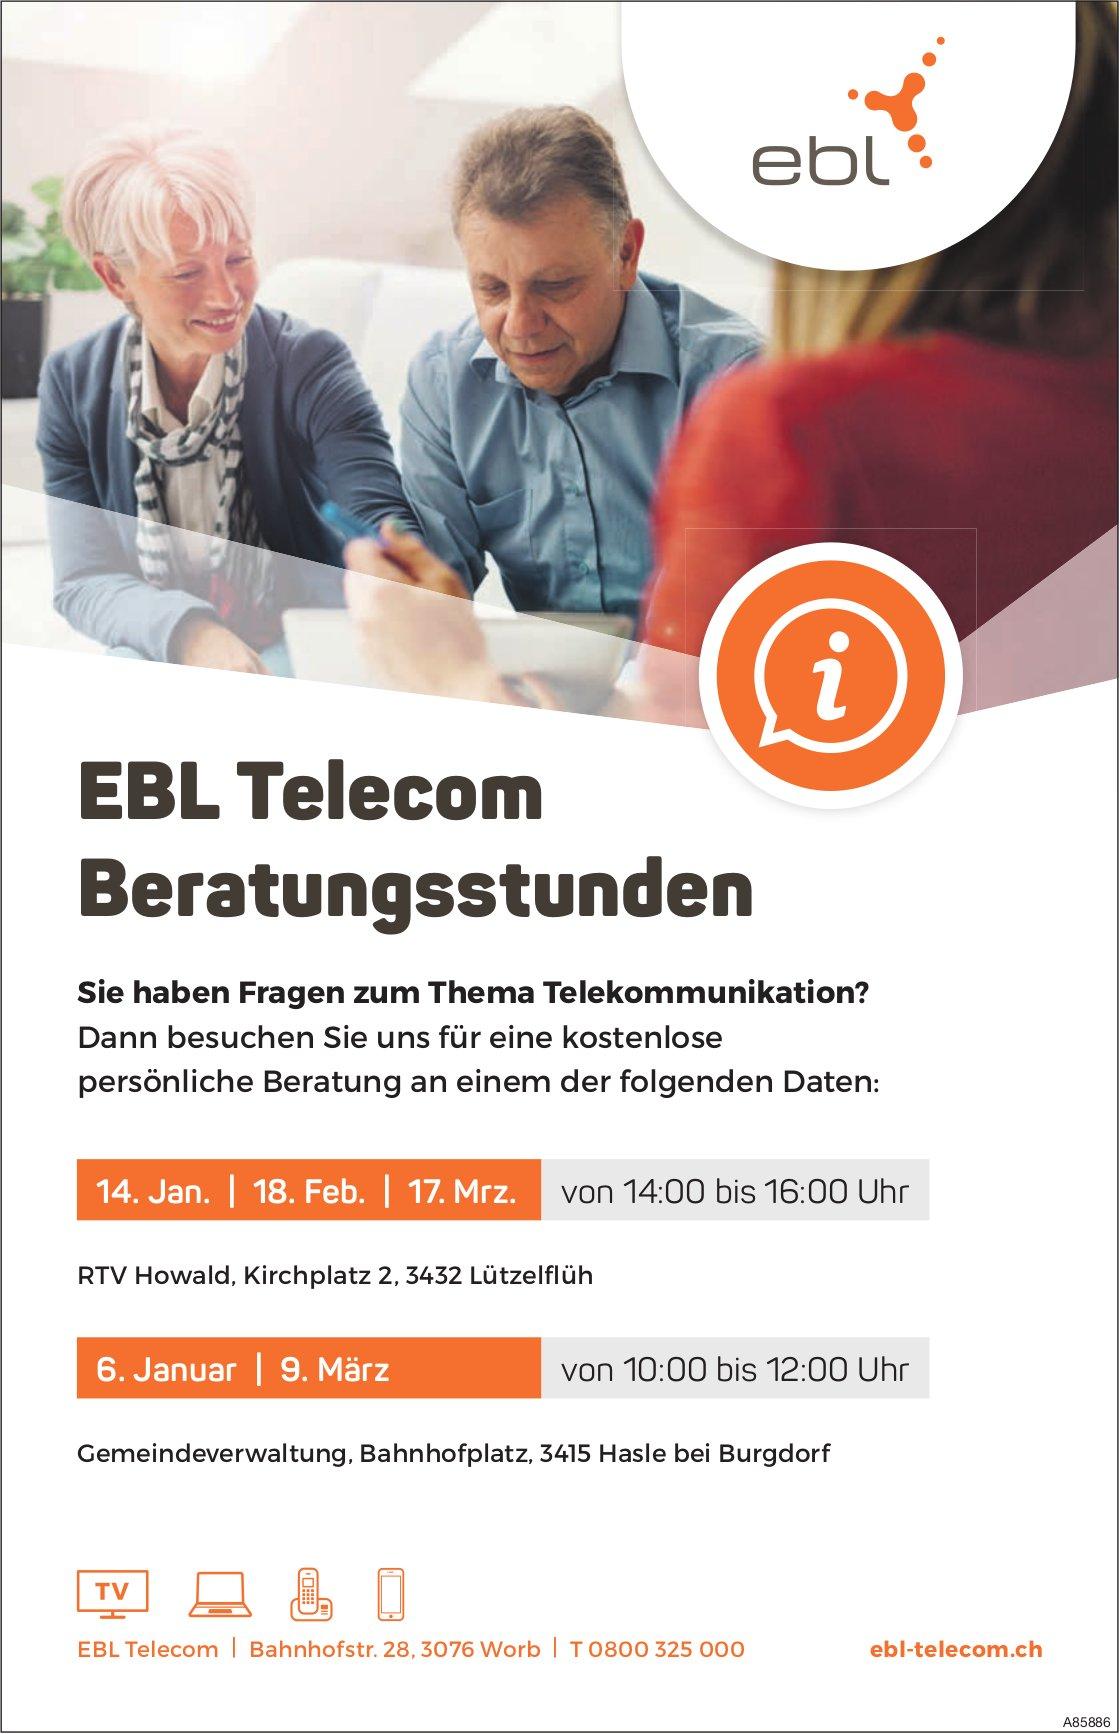 EBL Telecom Beratungsstunden, 14. Januar, 18. Februar, 9. + 17. März, Lützelflüh und Hasle b. B.